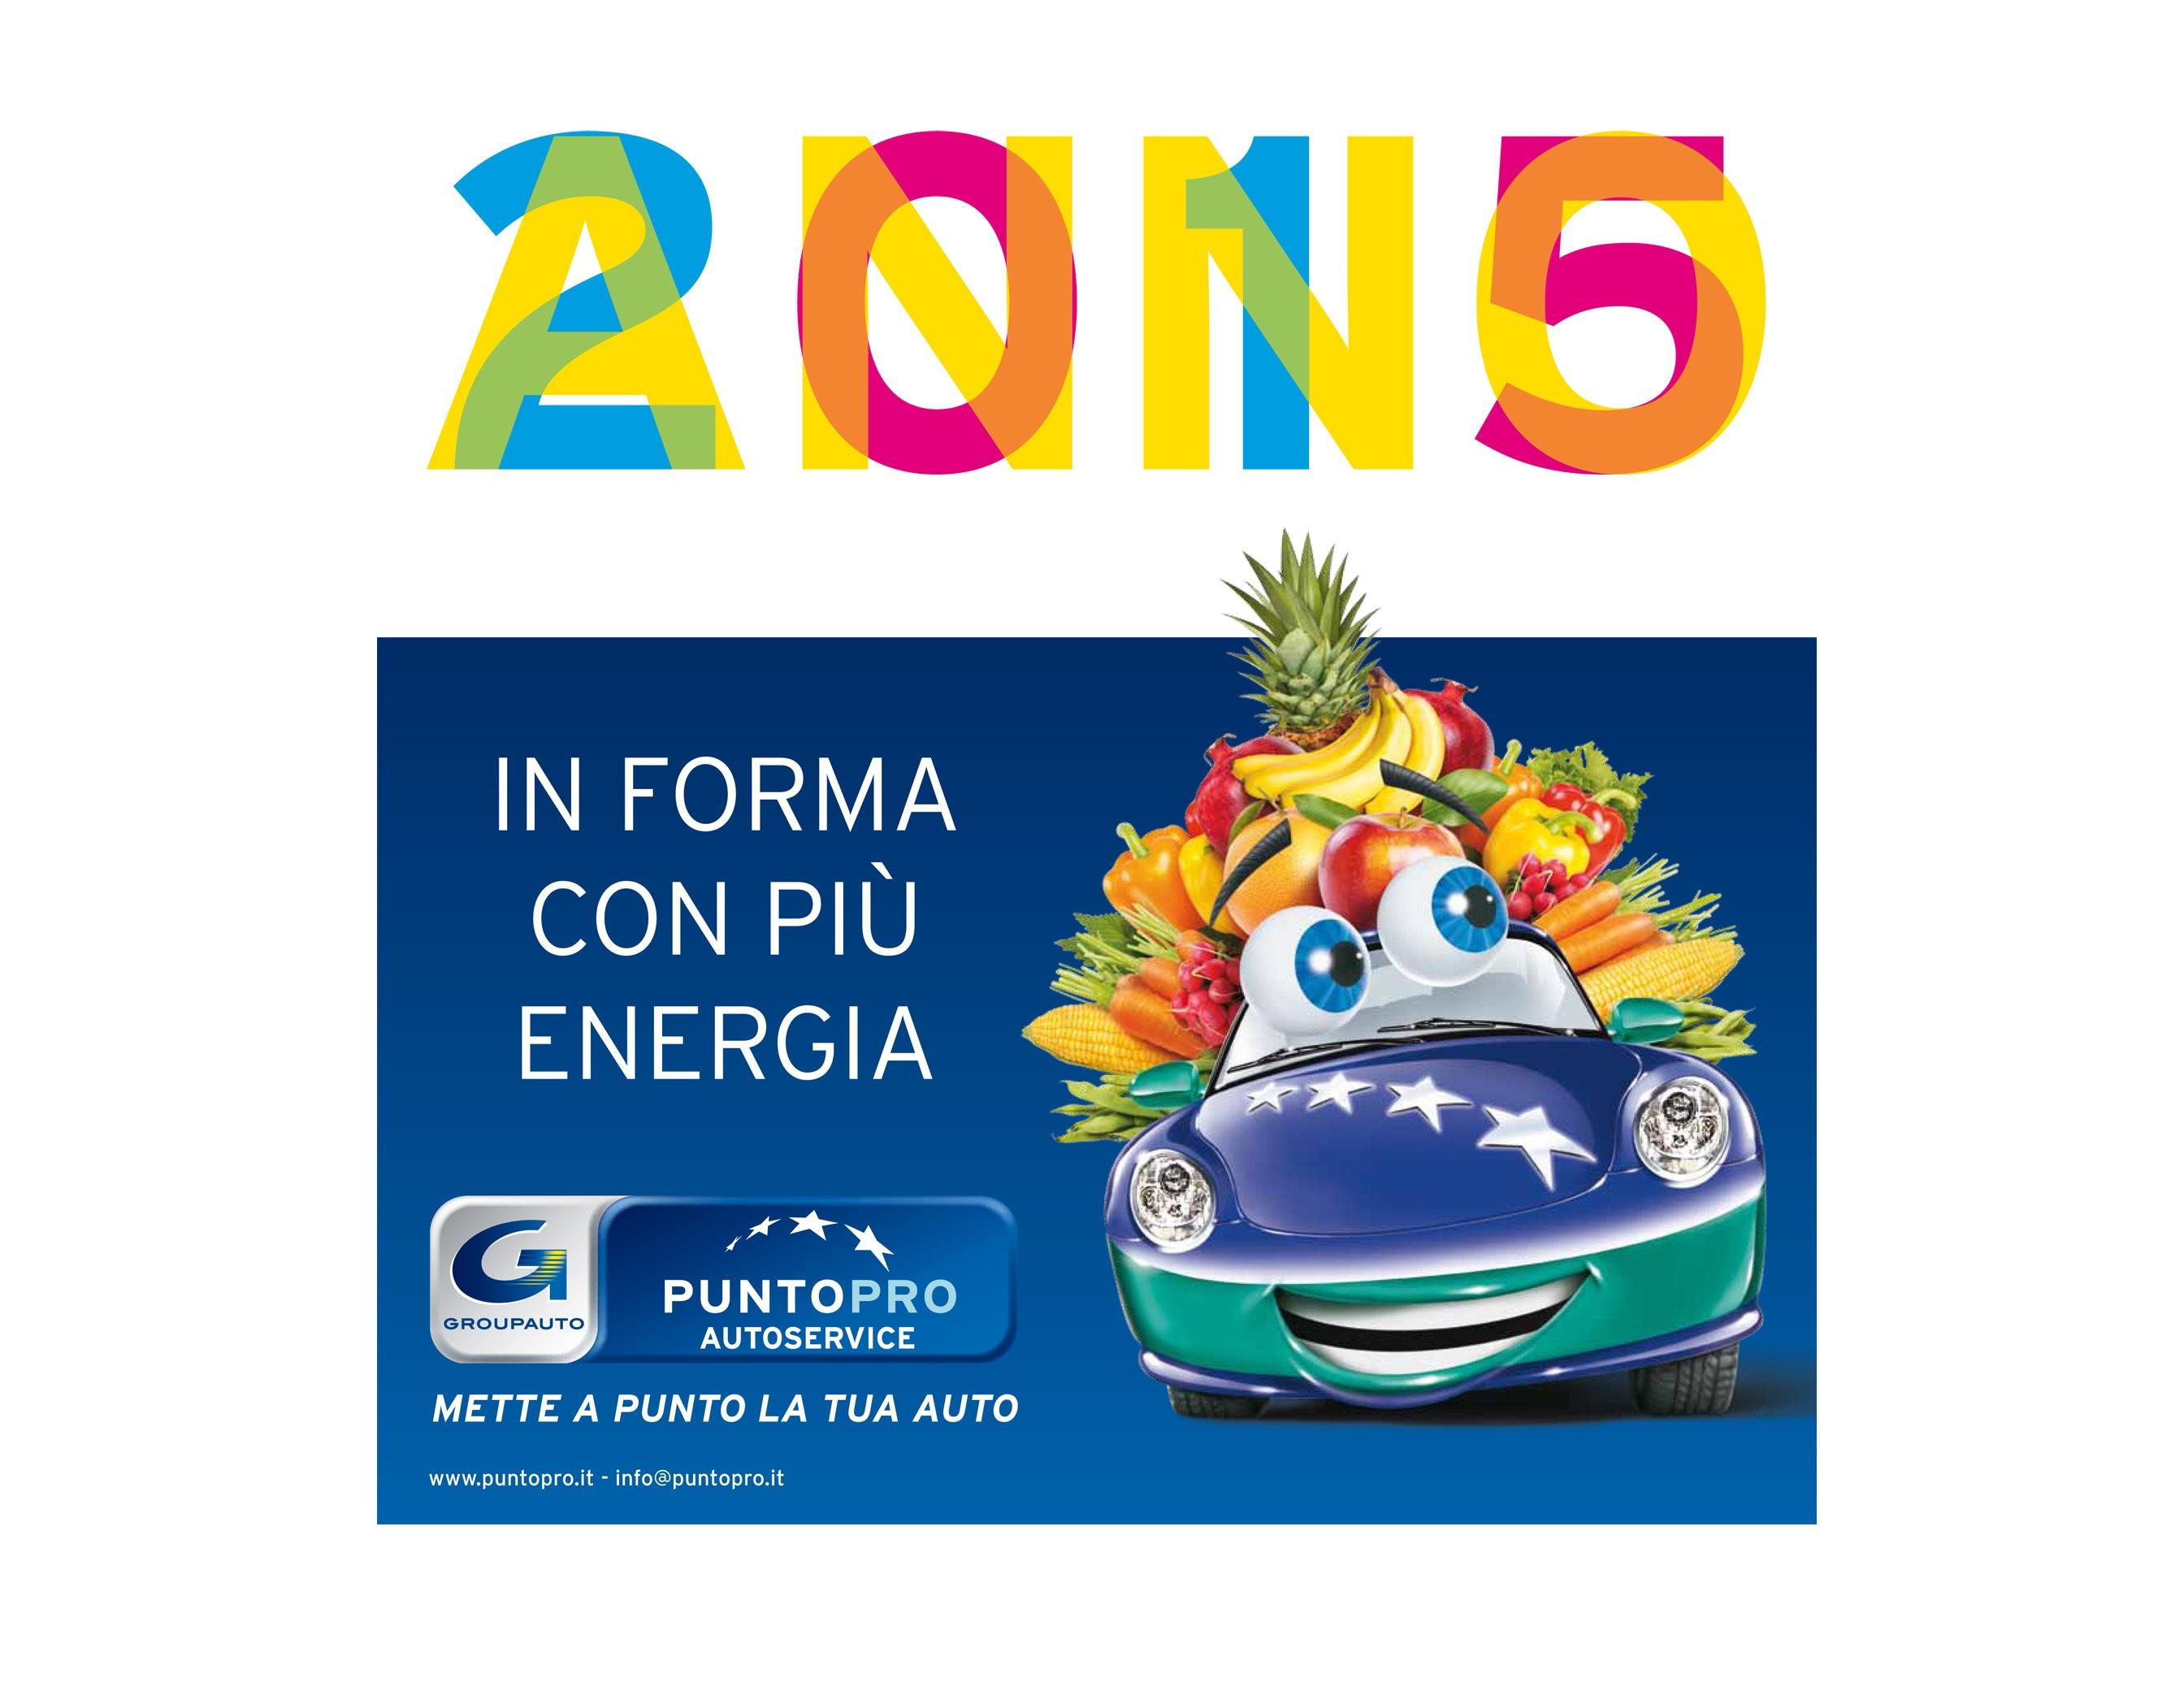 PUNTOPRO 2015: in forma con più energia